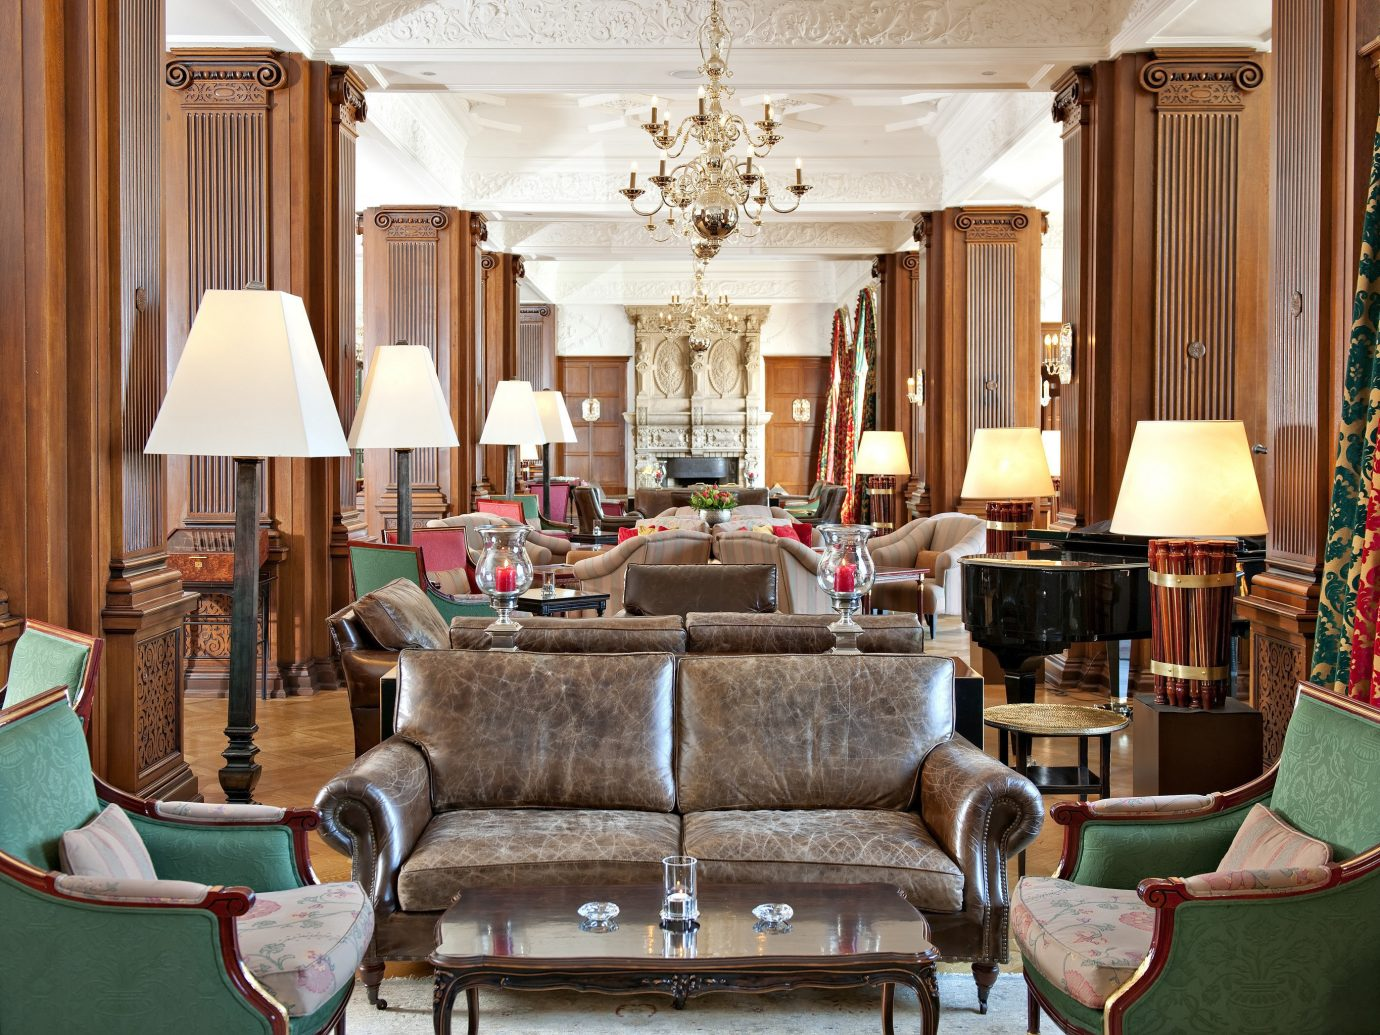 Lobby at the Hotel Carlton in St. Moritz Switzerland